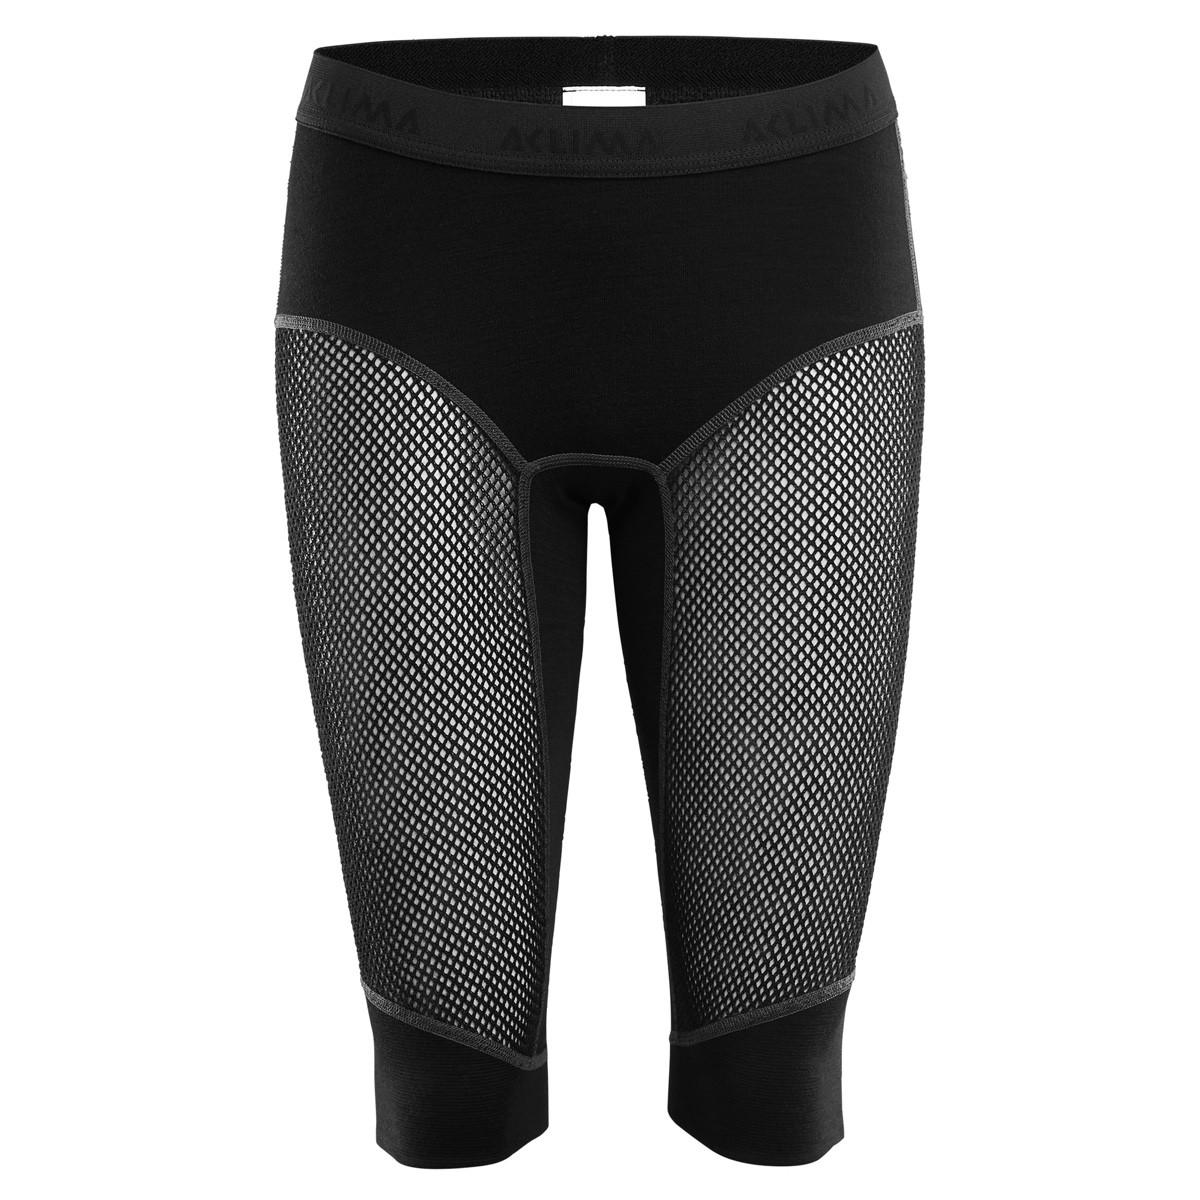 234390a7 Aclima Woolnet Shorts Long, Woman Jet Black   Fjellsport.no